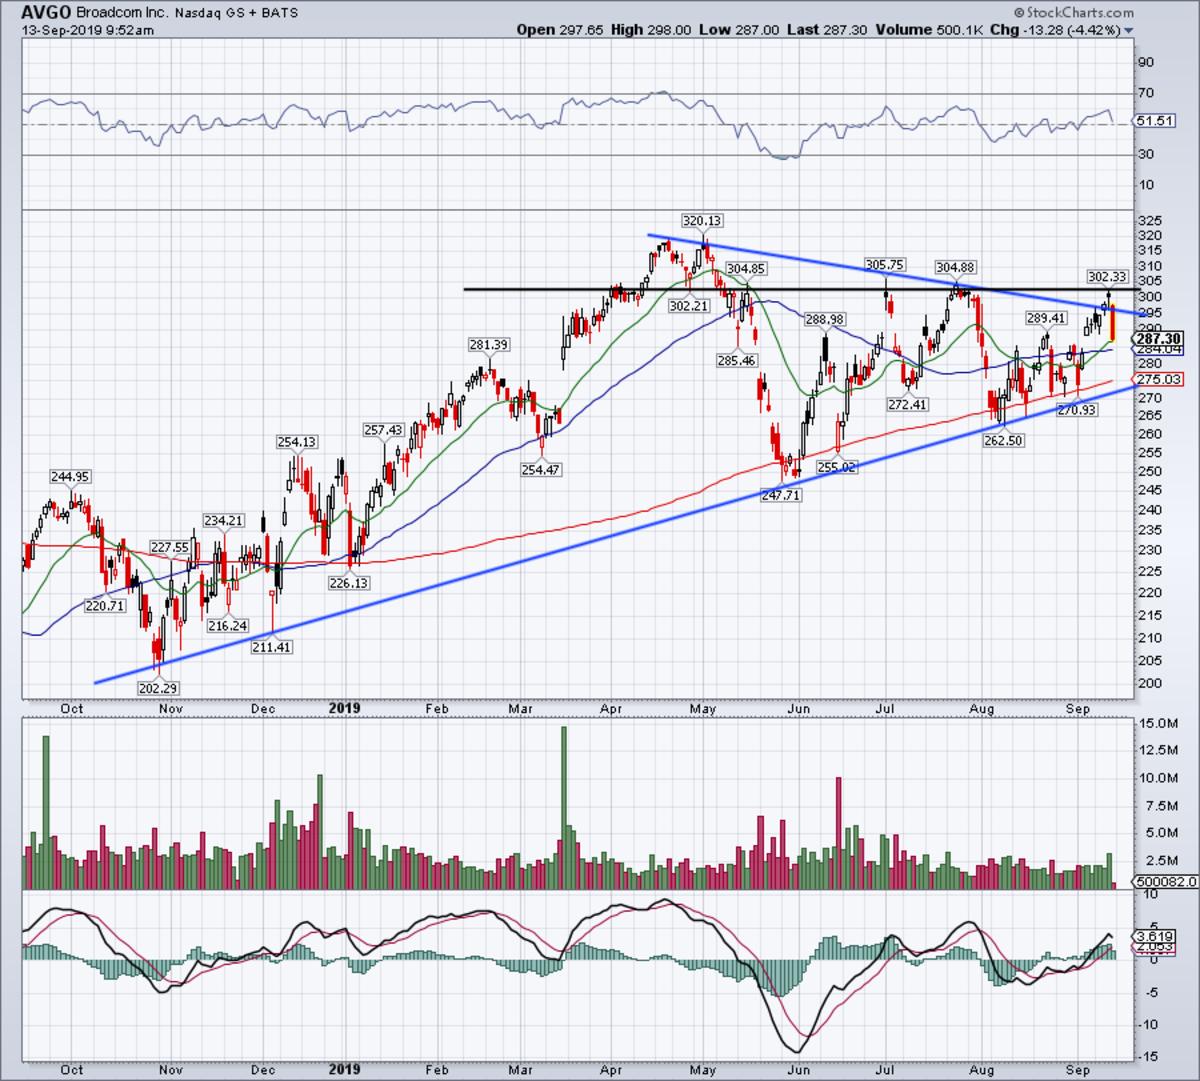 Daily chart of Broadcom stock.